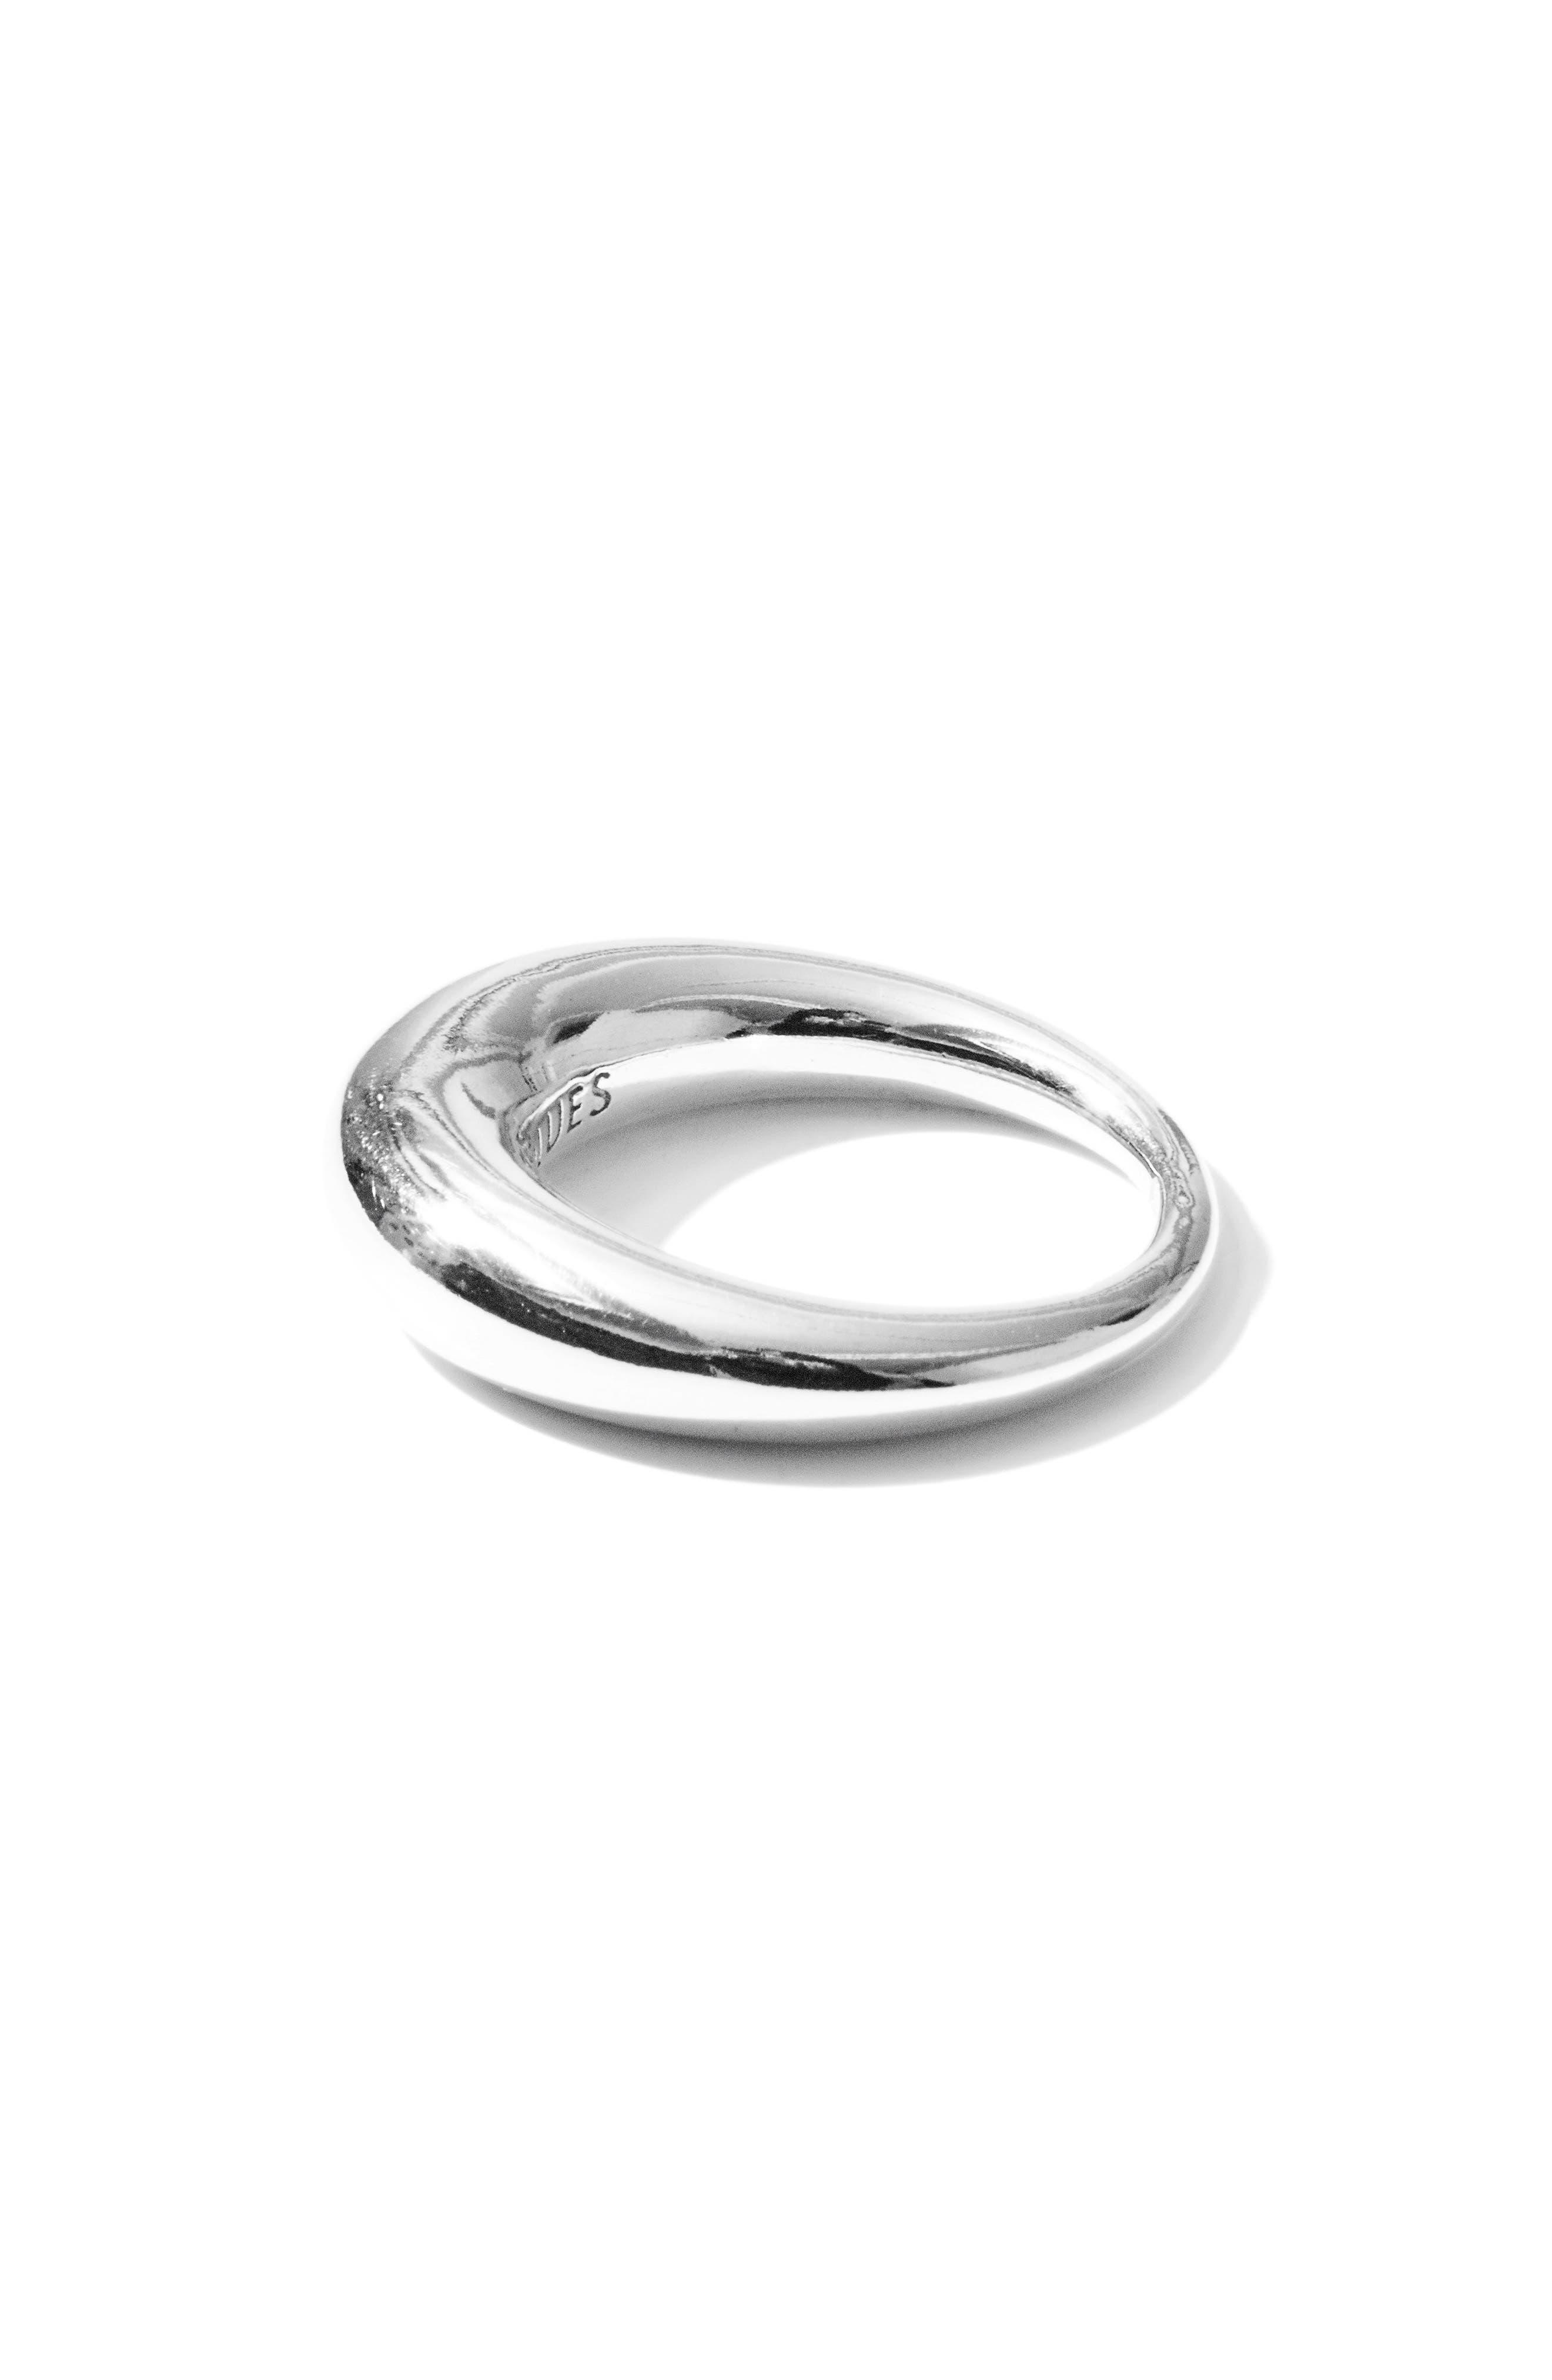 Large Snake Polished Silver Ring,                             Alternate thumbnail 4, color,                             POLISHED SILVER